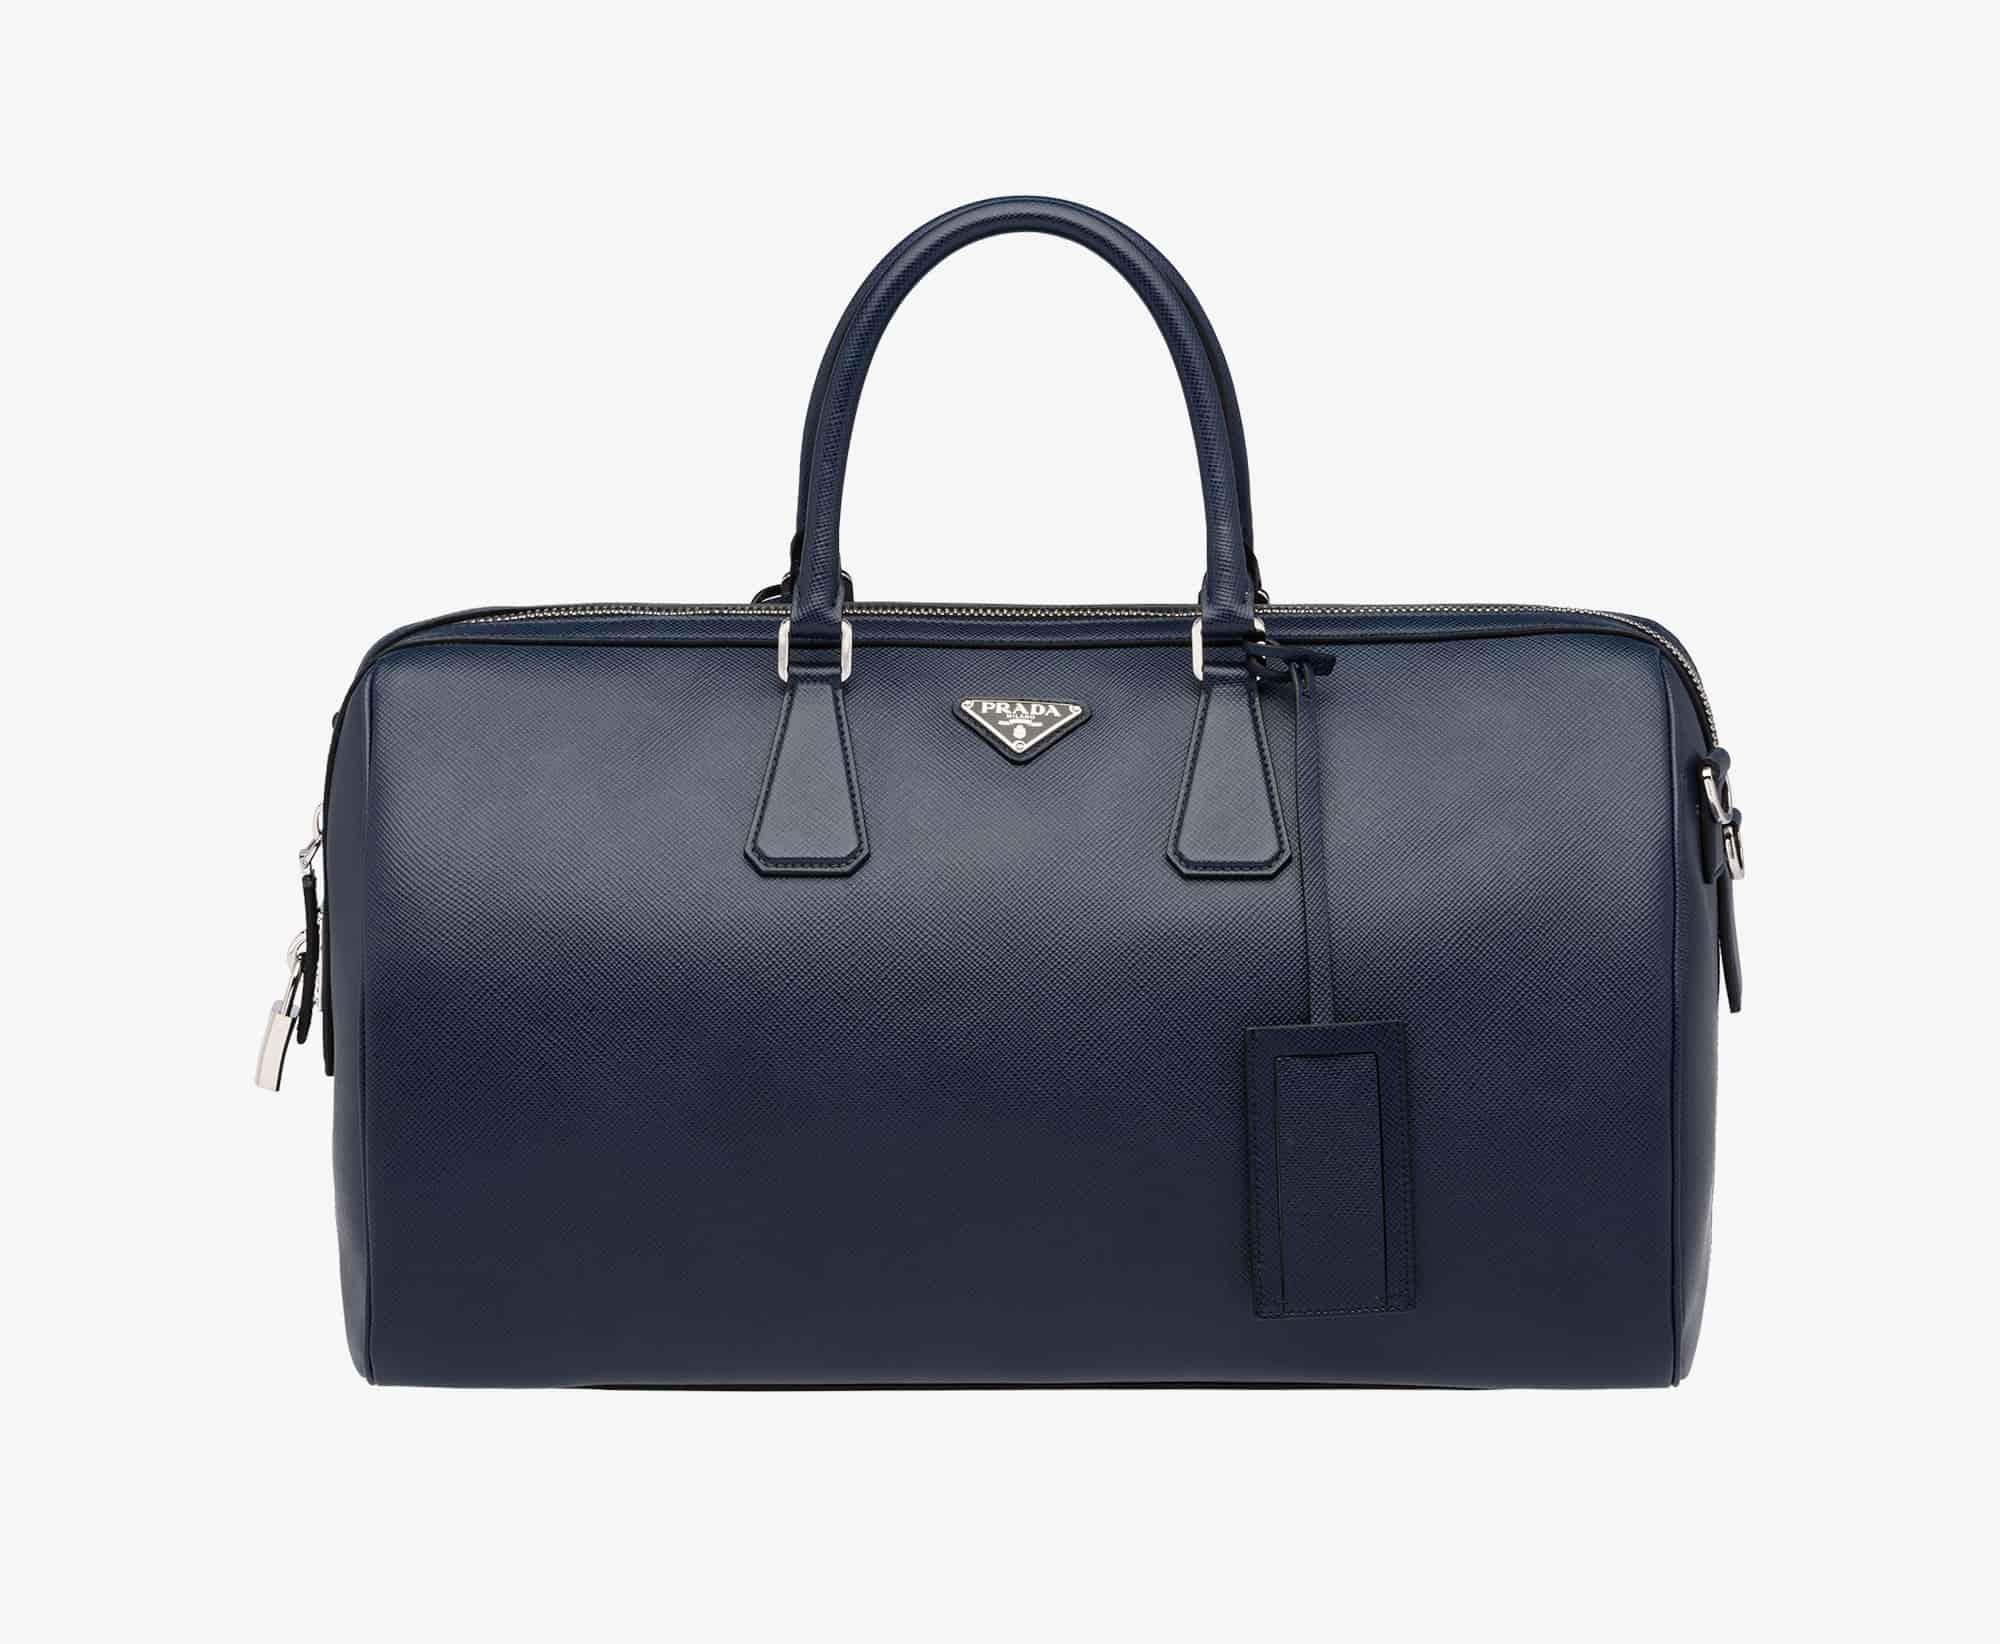 76ac65dc263 Buy Prada Weekender Luggage Bag Baltic Blue  2VC372 2FAD F0216 V OOO ...